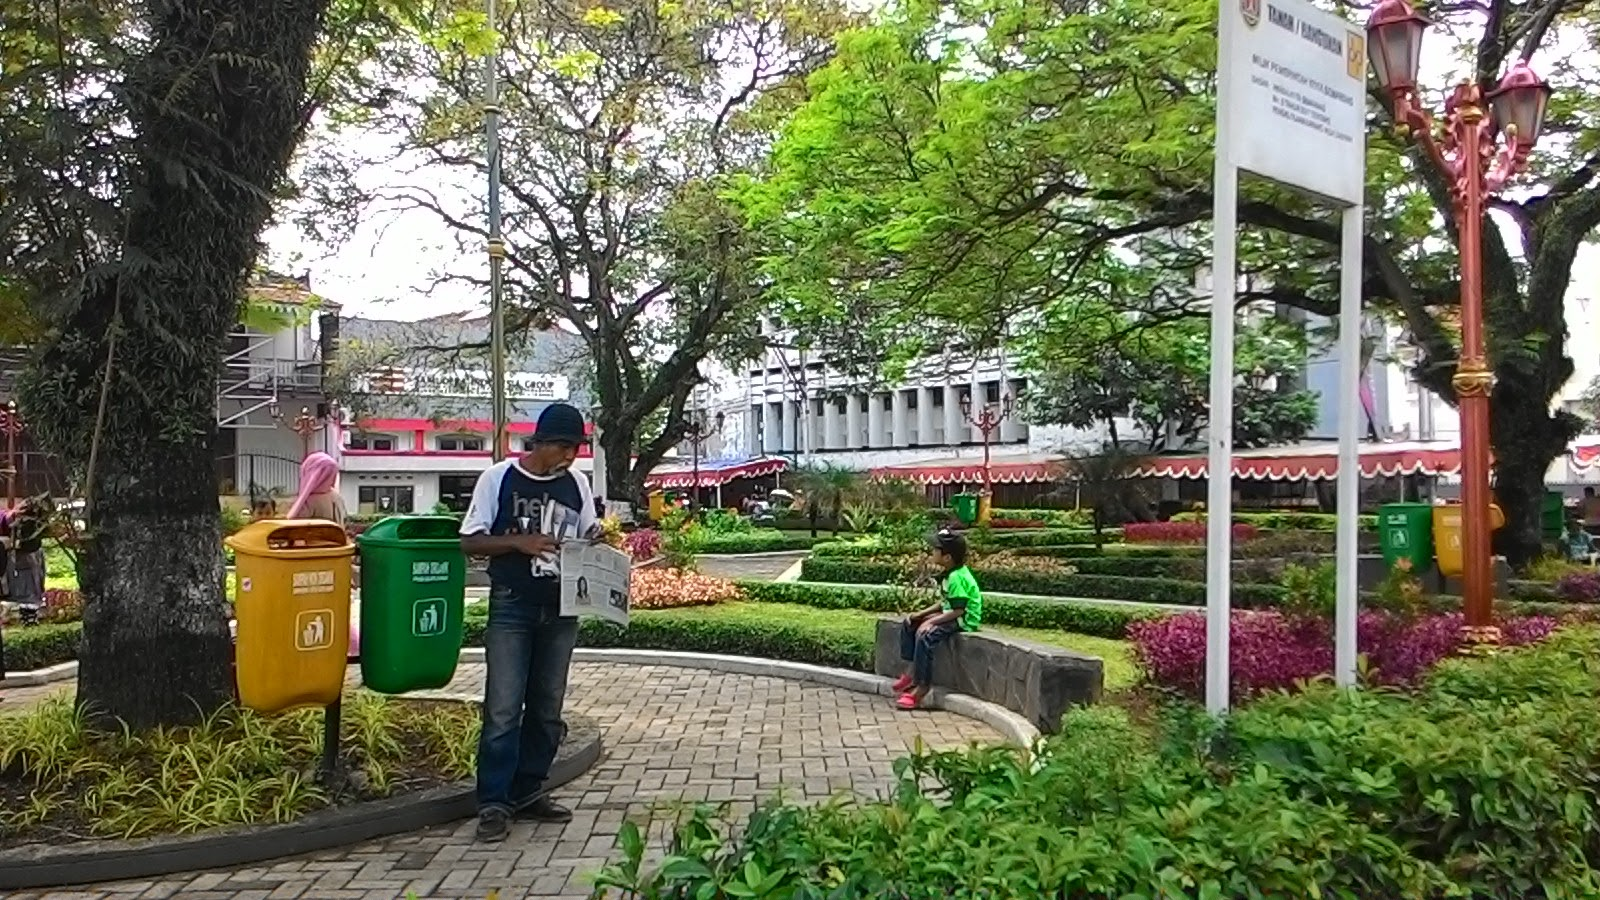 Small Kecil Tapi Penting Naik Bus Tingkat Semarjawi Taman Srigunting